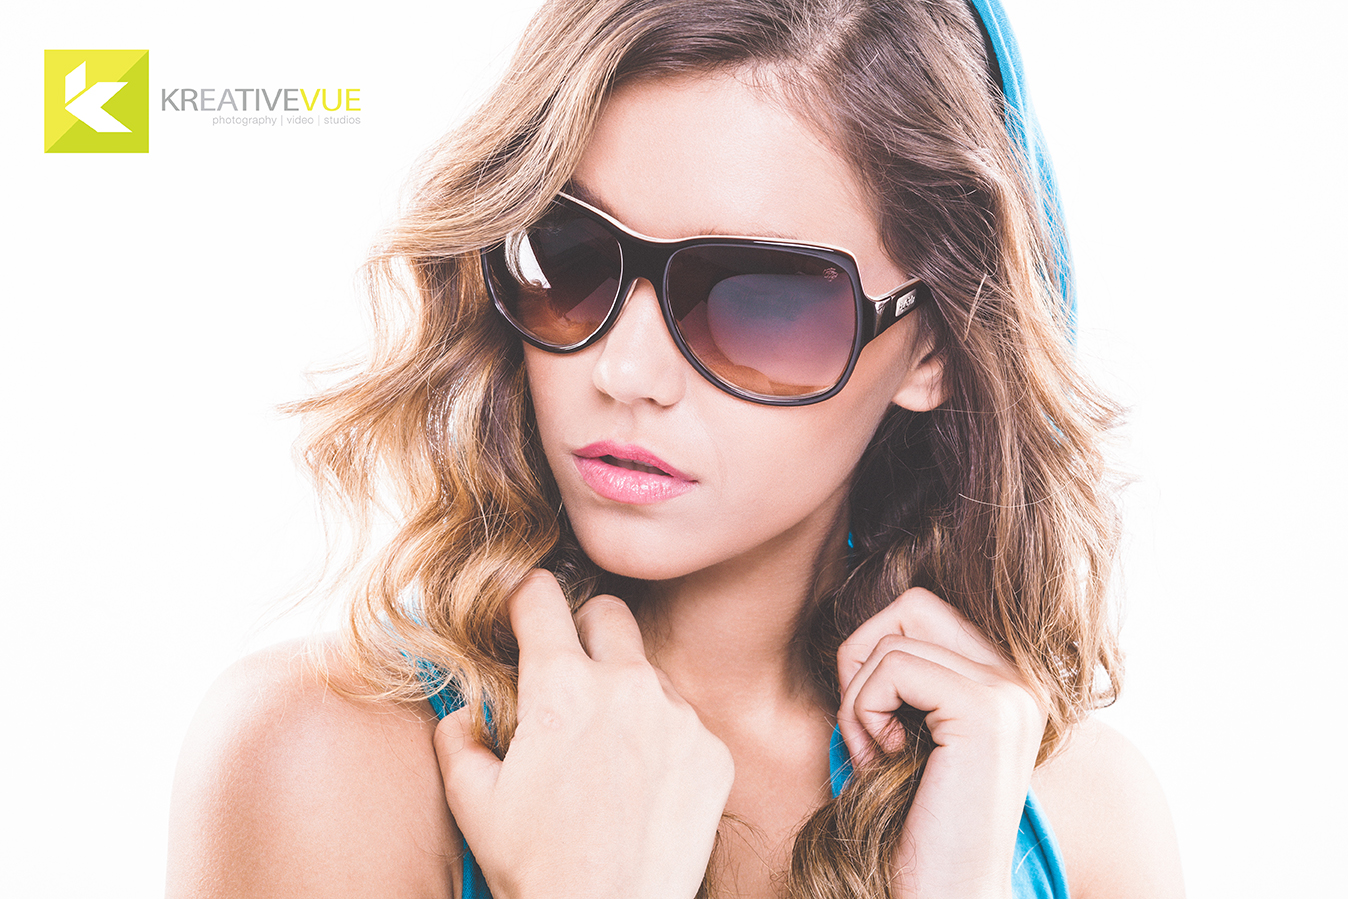 BlackFly_Sunglasses-Camia-0115.jpg